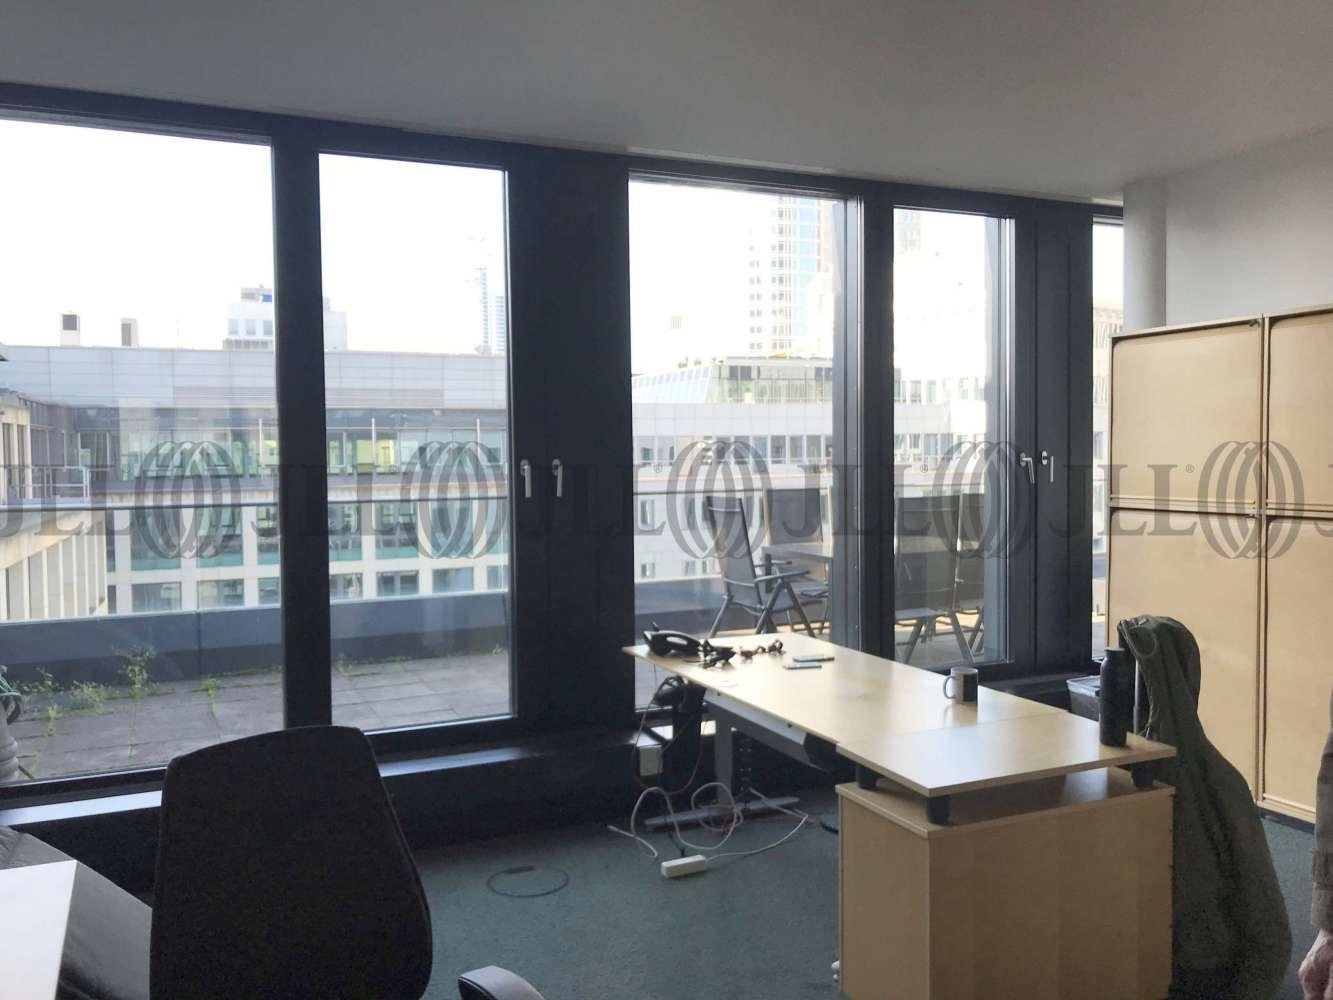 Büros Frankfurt am main, 60329 - Büro - Frankfurt am Main, Bahnhofsviertel - F0050 - 10890338